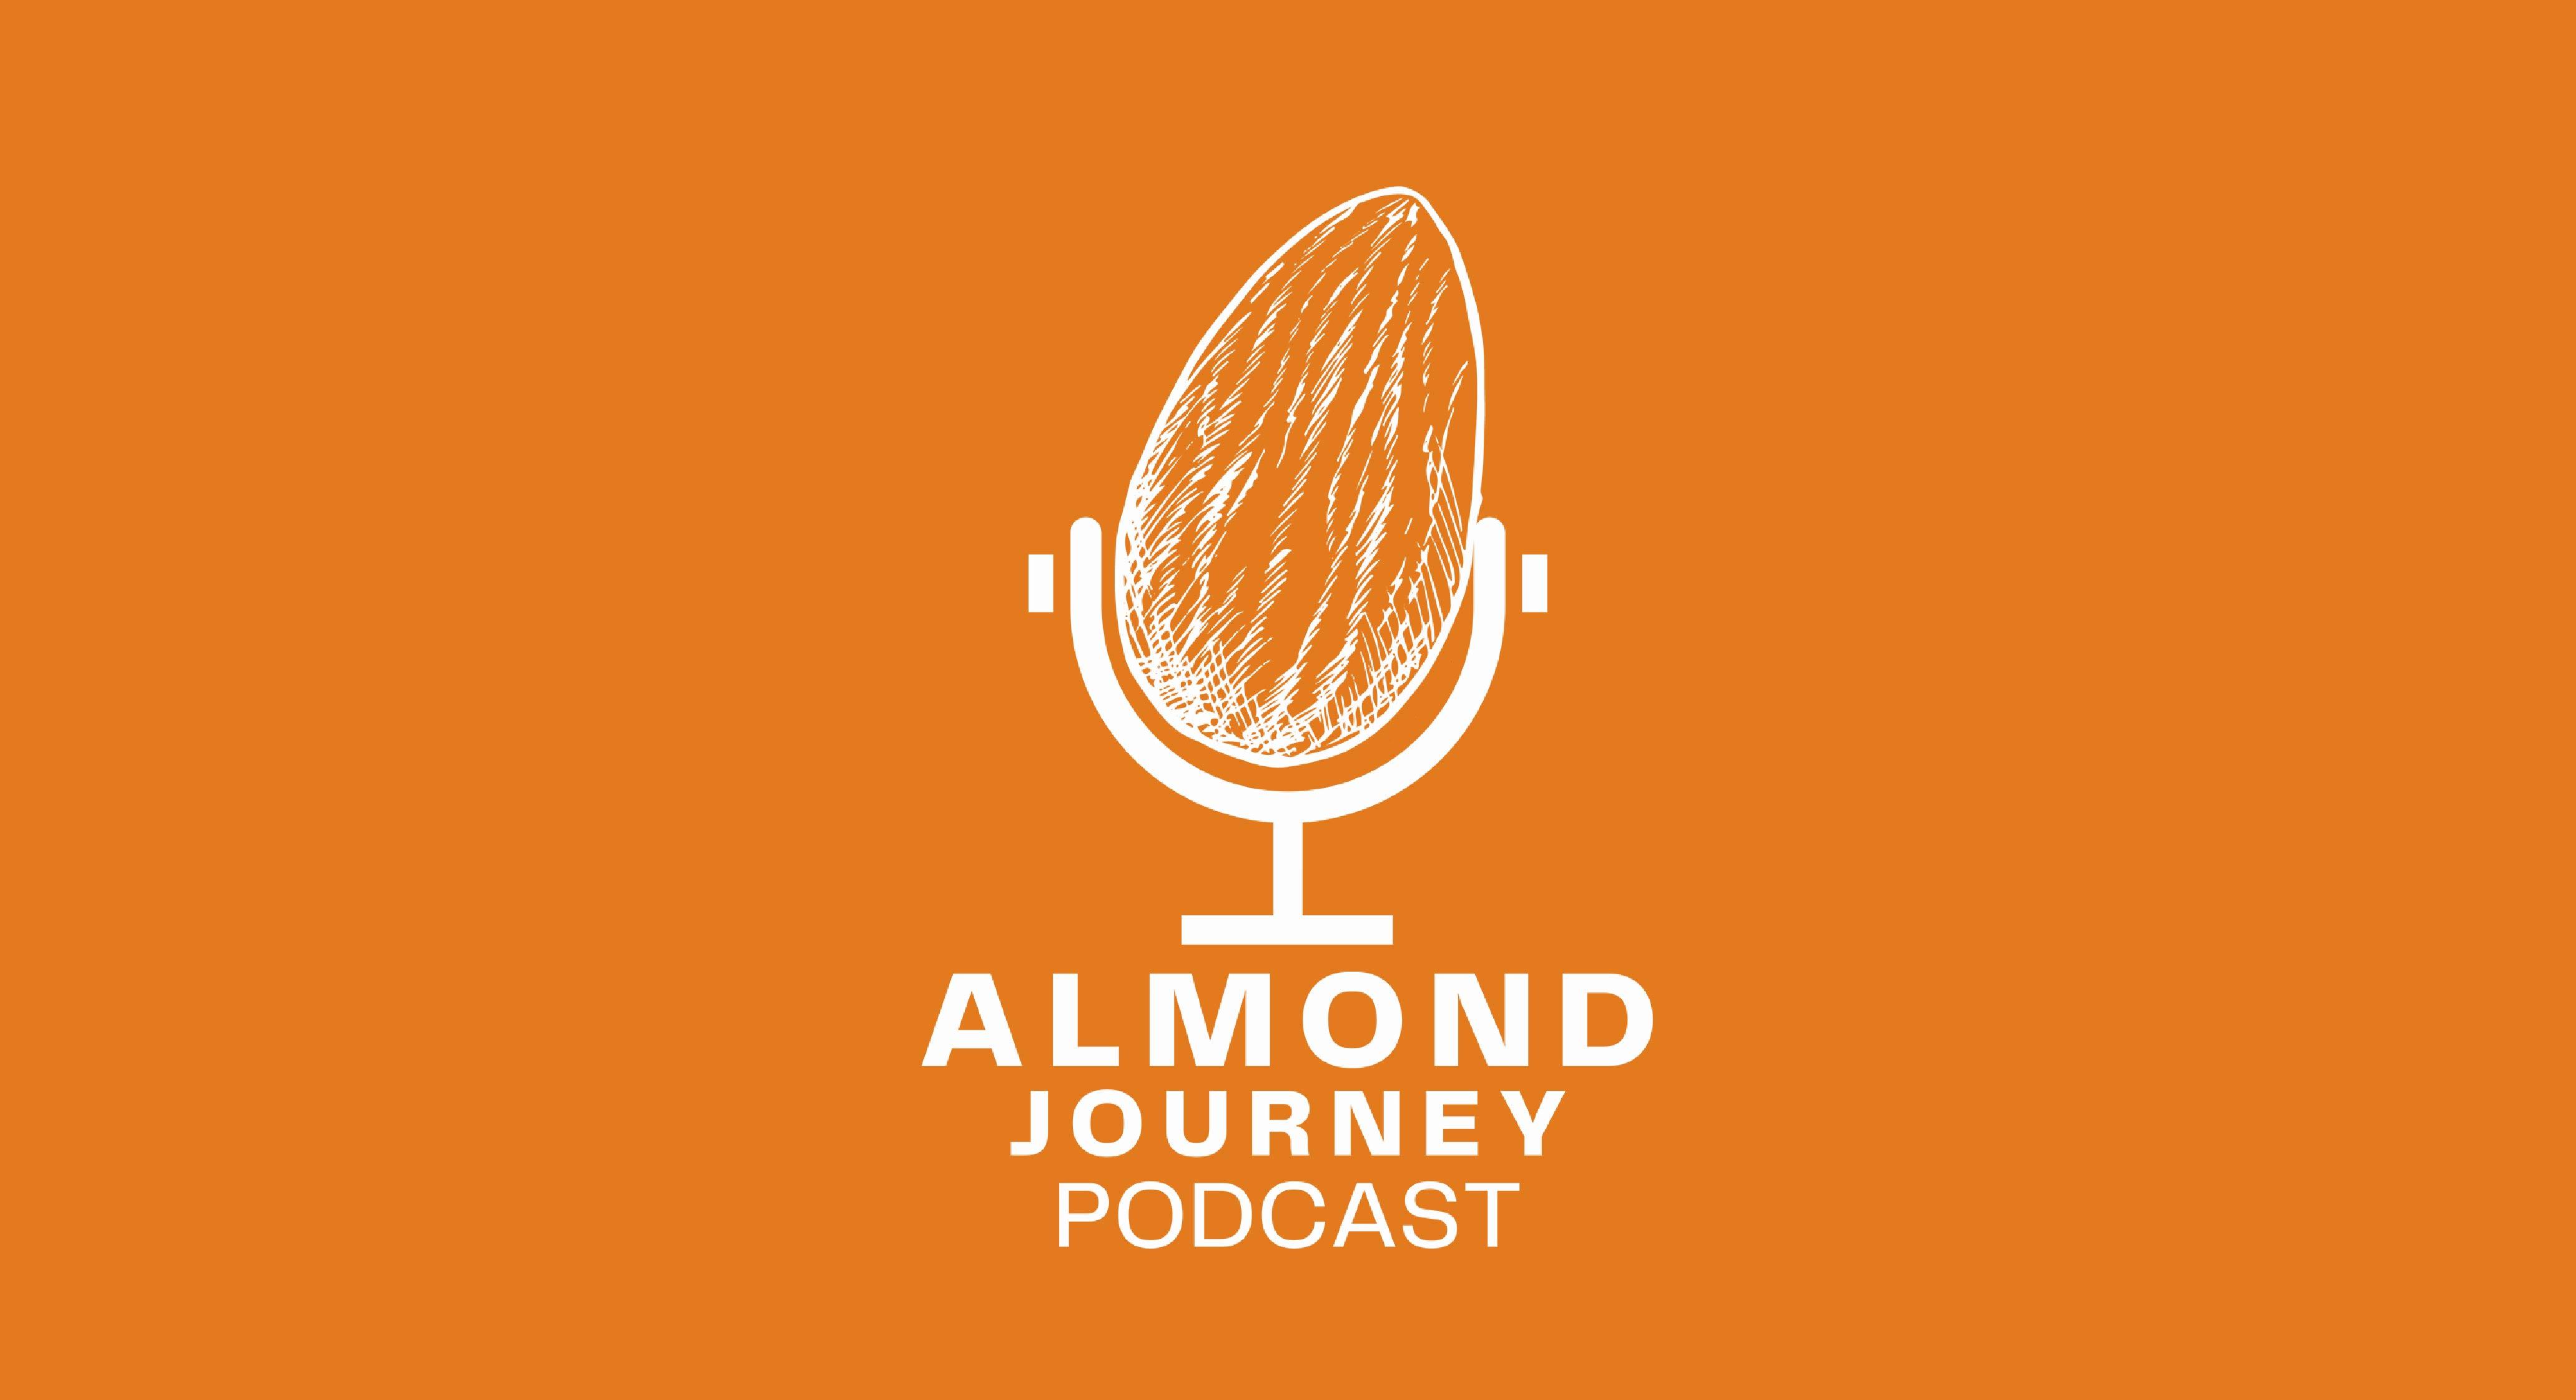 almondjourney-01_1.jpg